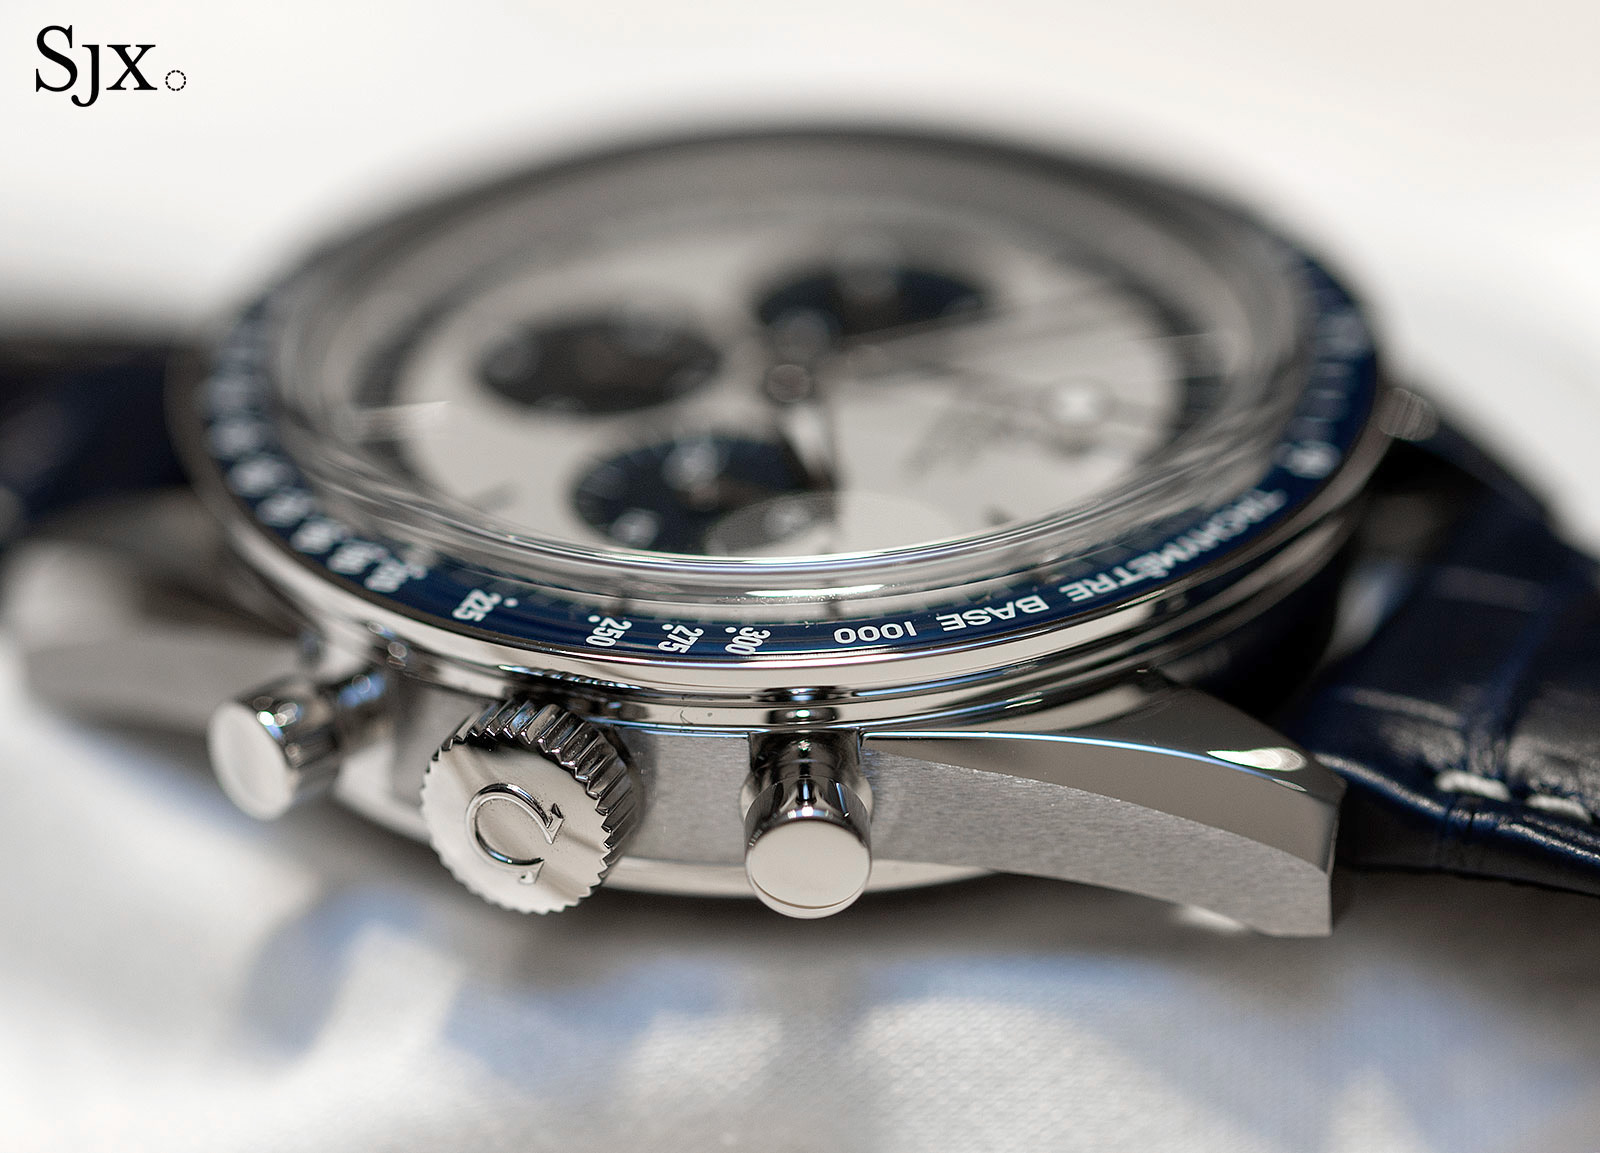 Omega Speedmaster Moonwatch CK2998 - 3